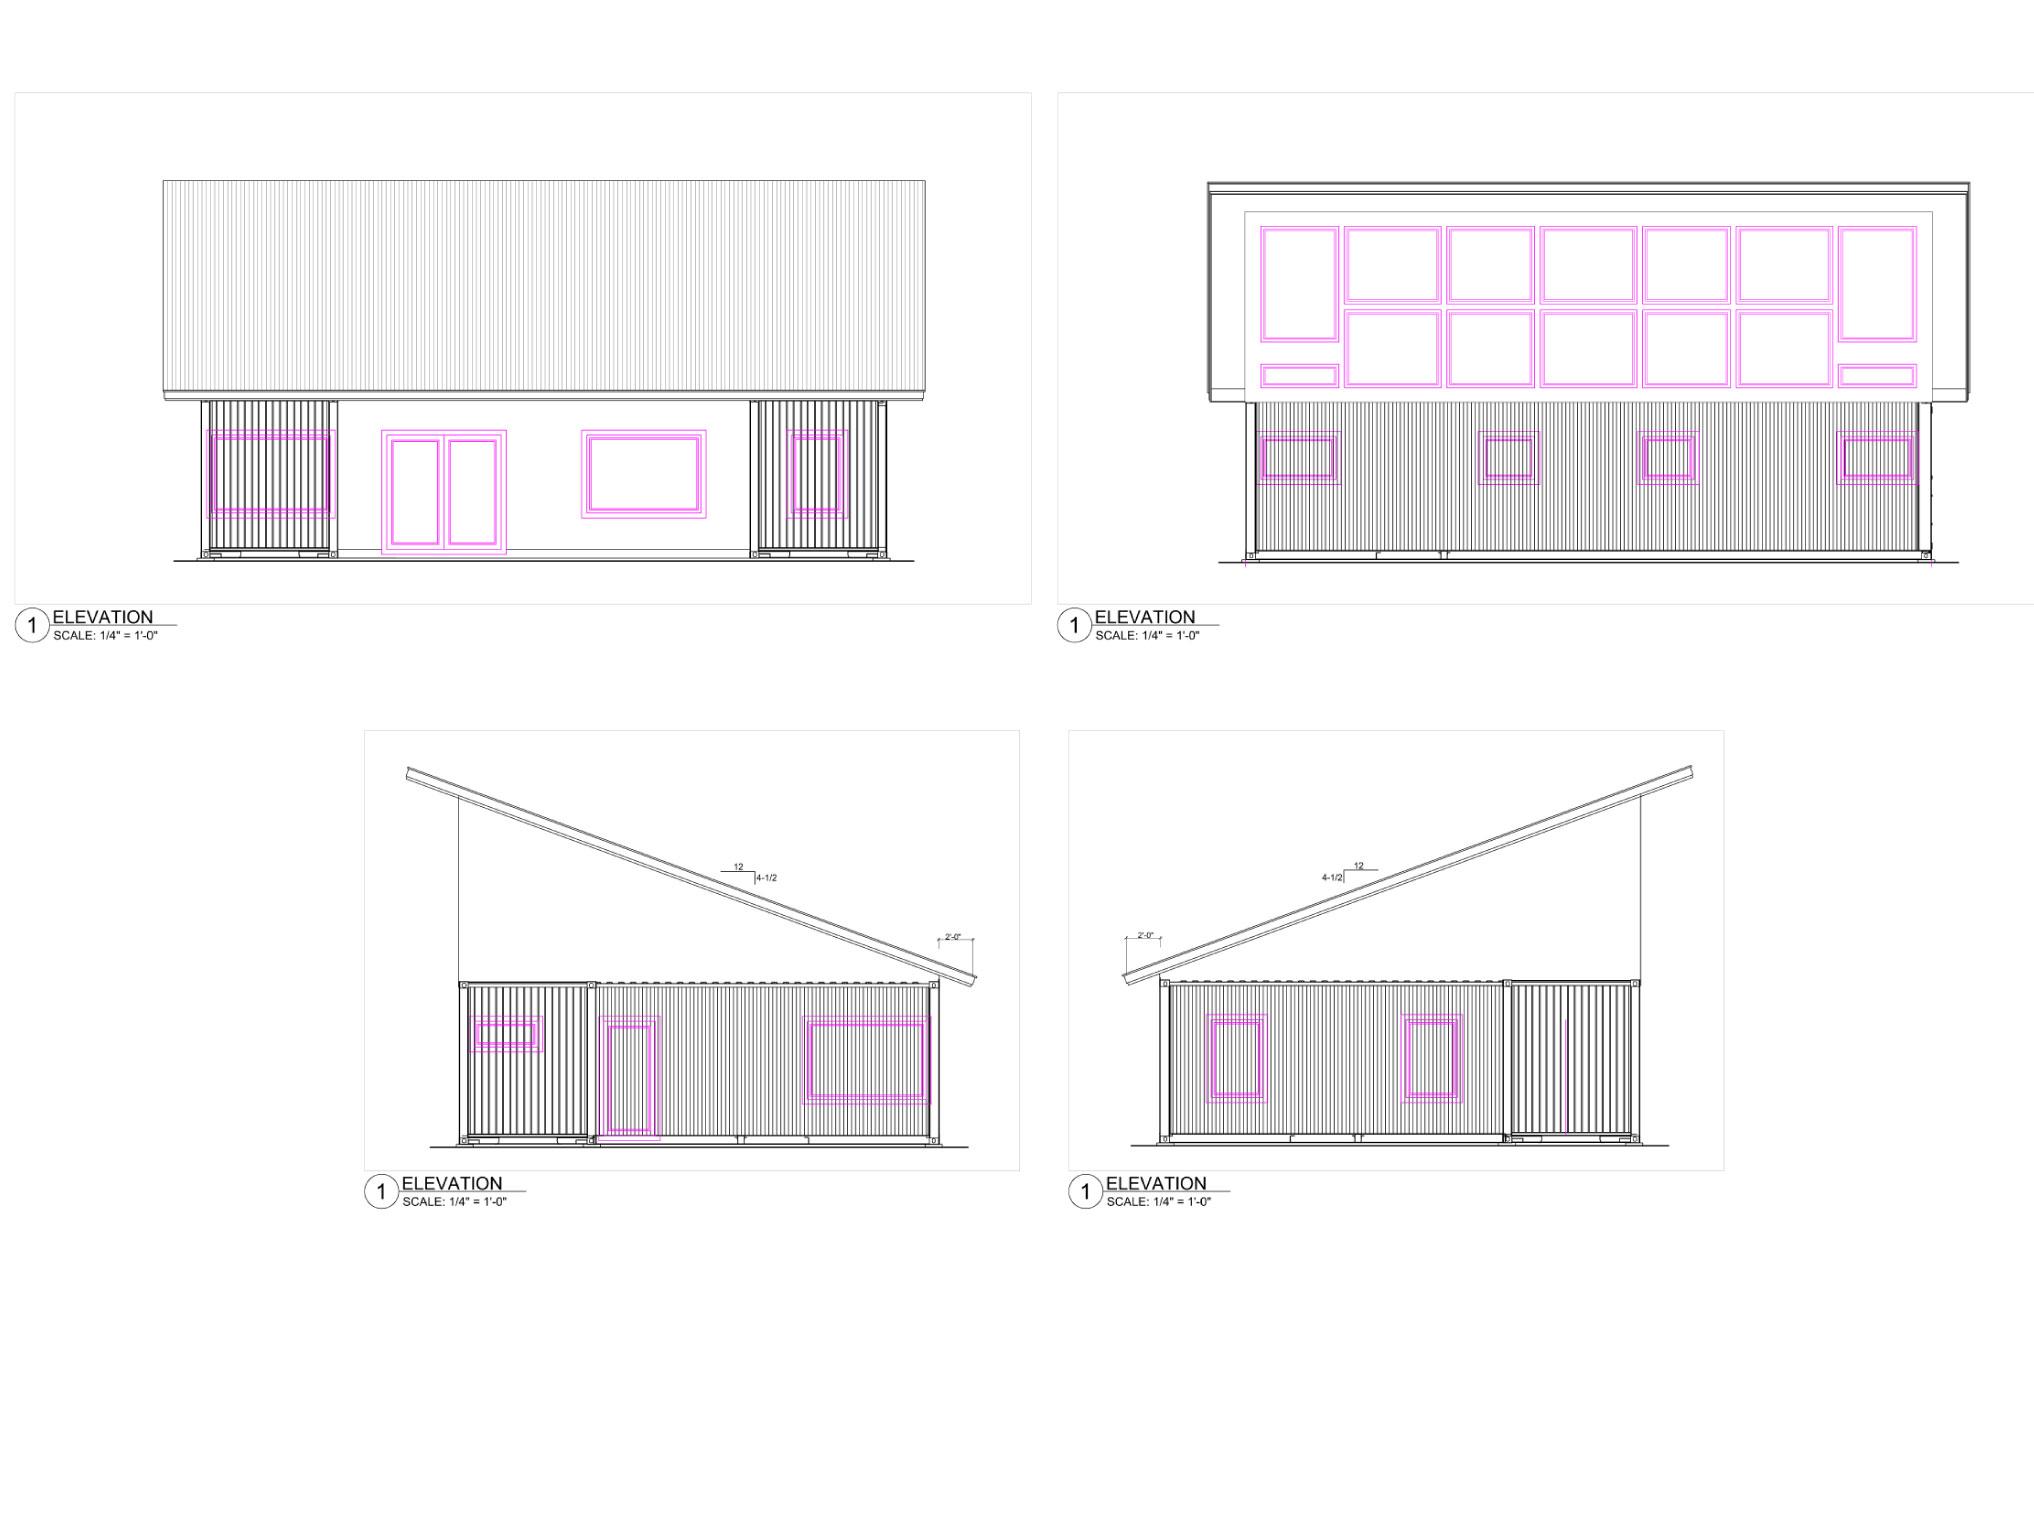 Much Mo Betta Plans 4021528 : roofplan1 from shippinghome.wordpress.com size 2034 x 1530 jpeg 209kB